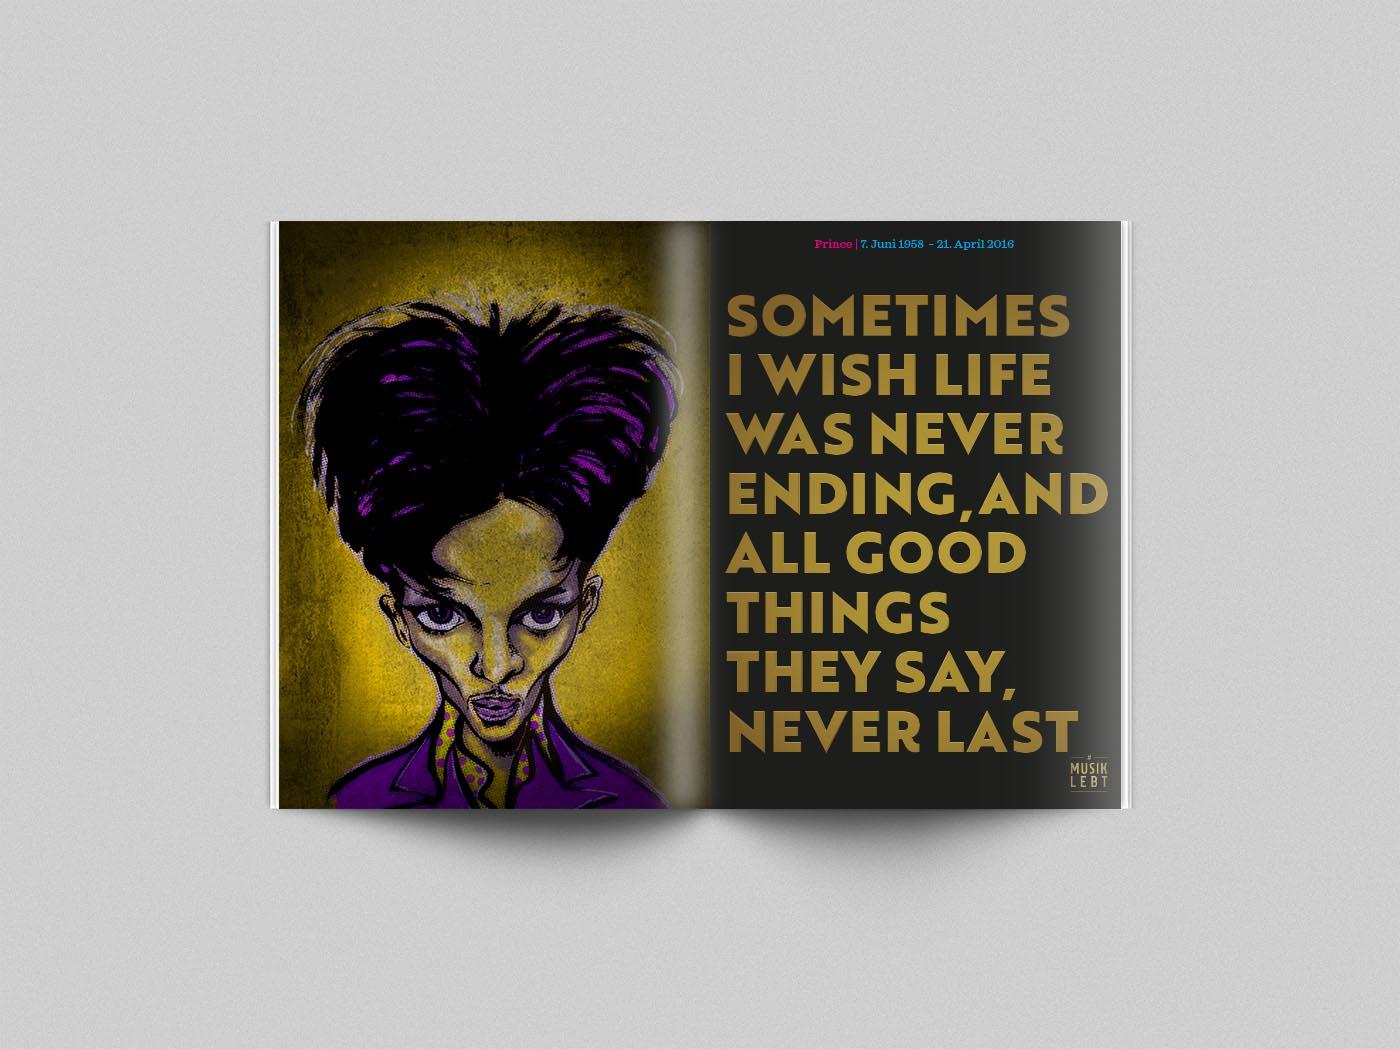 Musik lebt –Prince